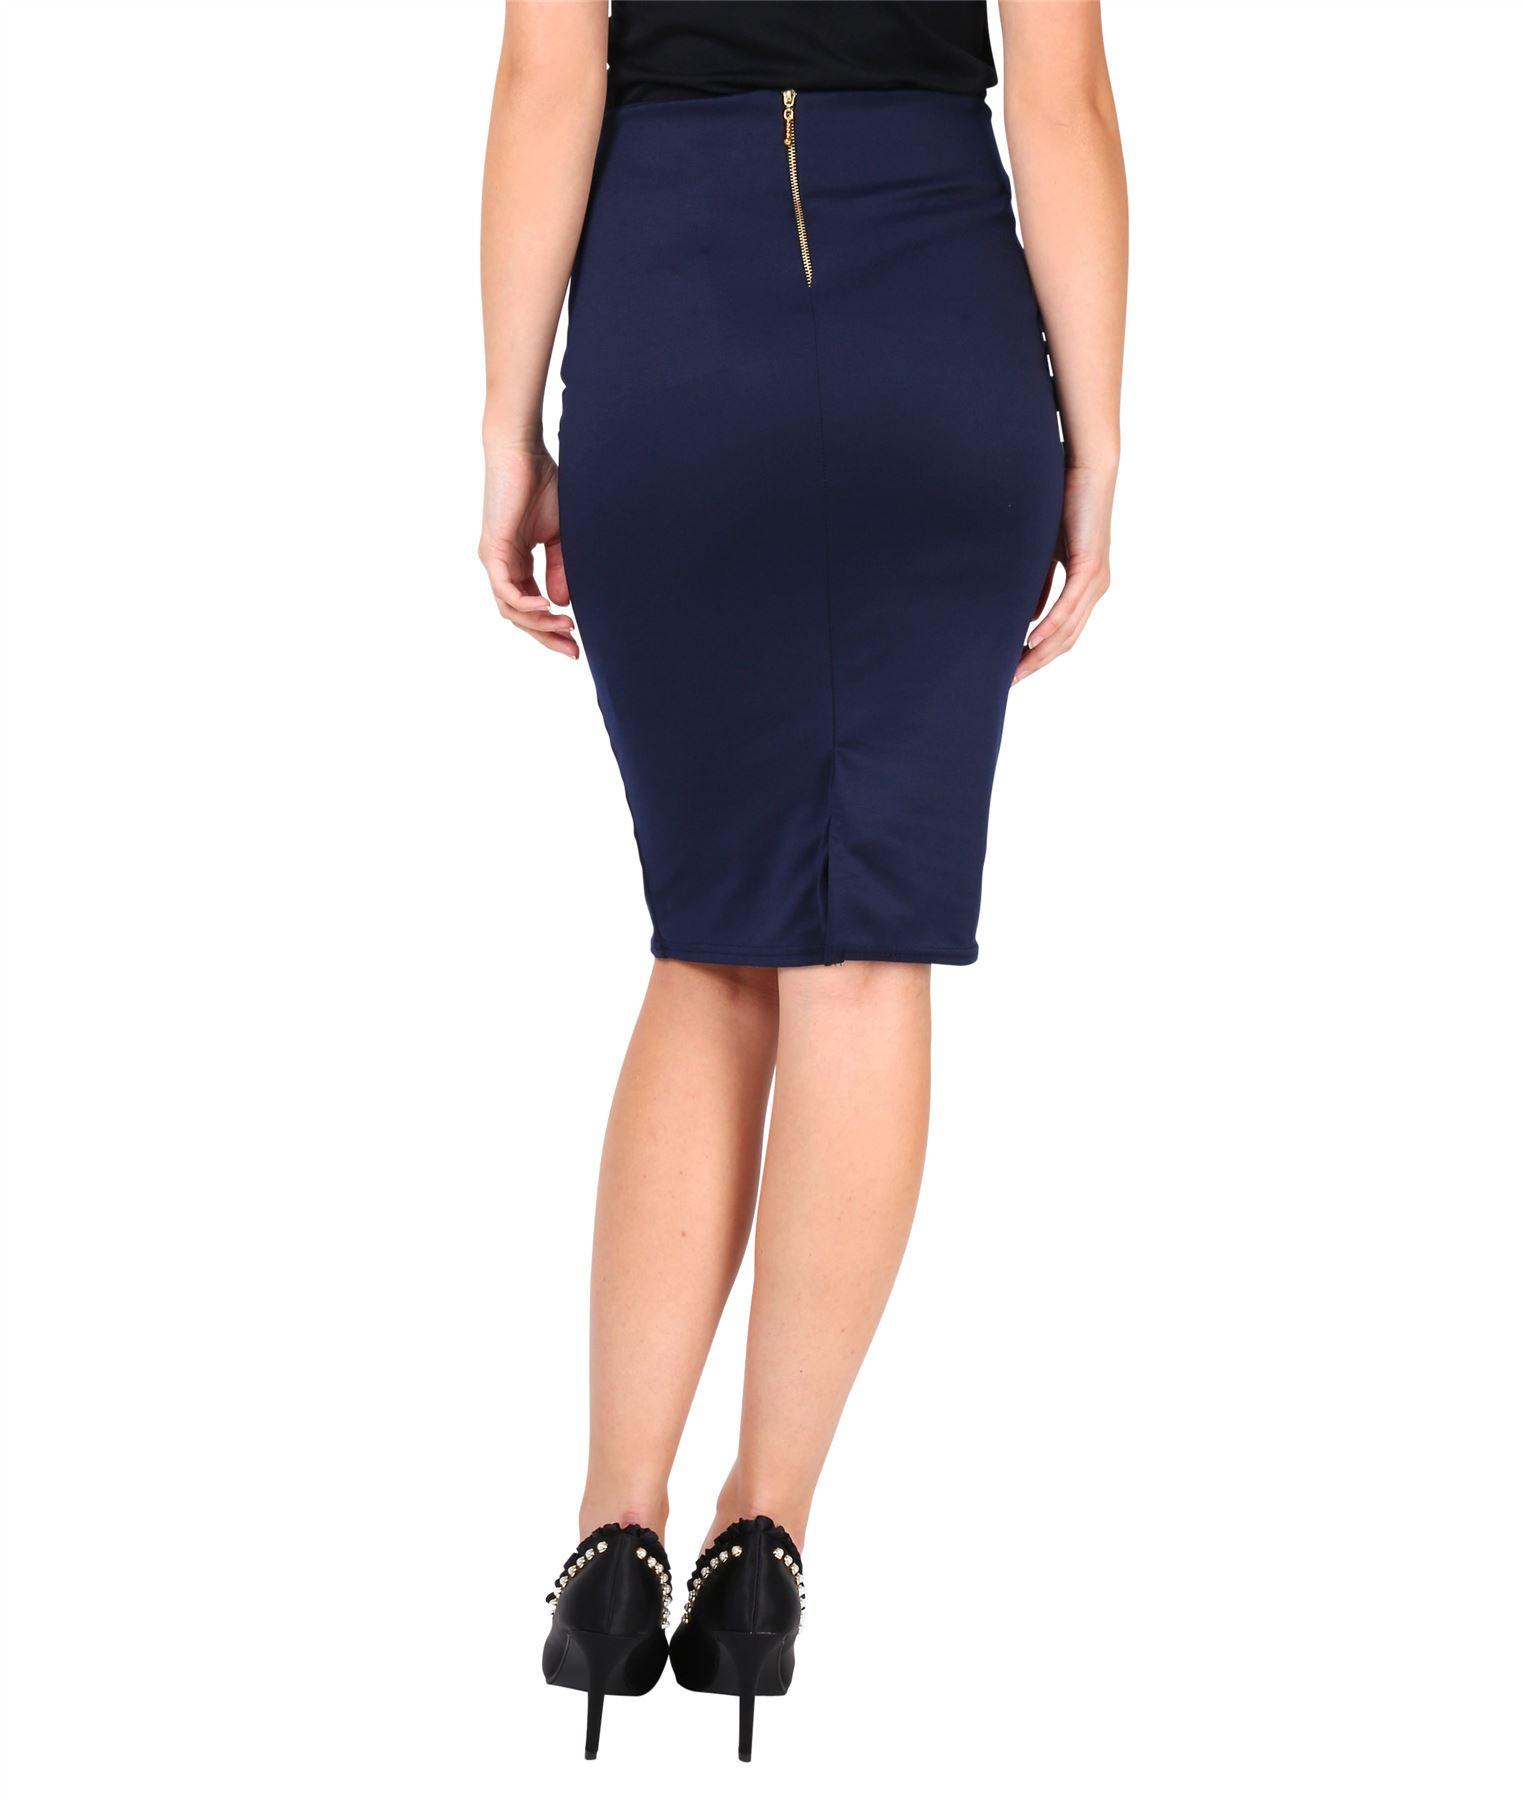 6407afb38df4 Womens Ladies Pencil Skirt Midi Knee Long High Waist Work Office Business  Smart